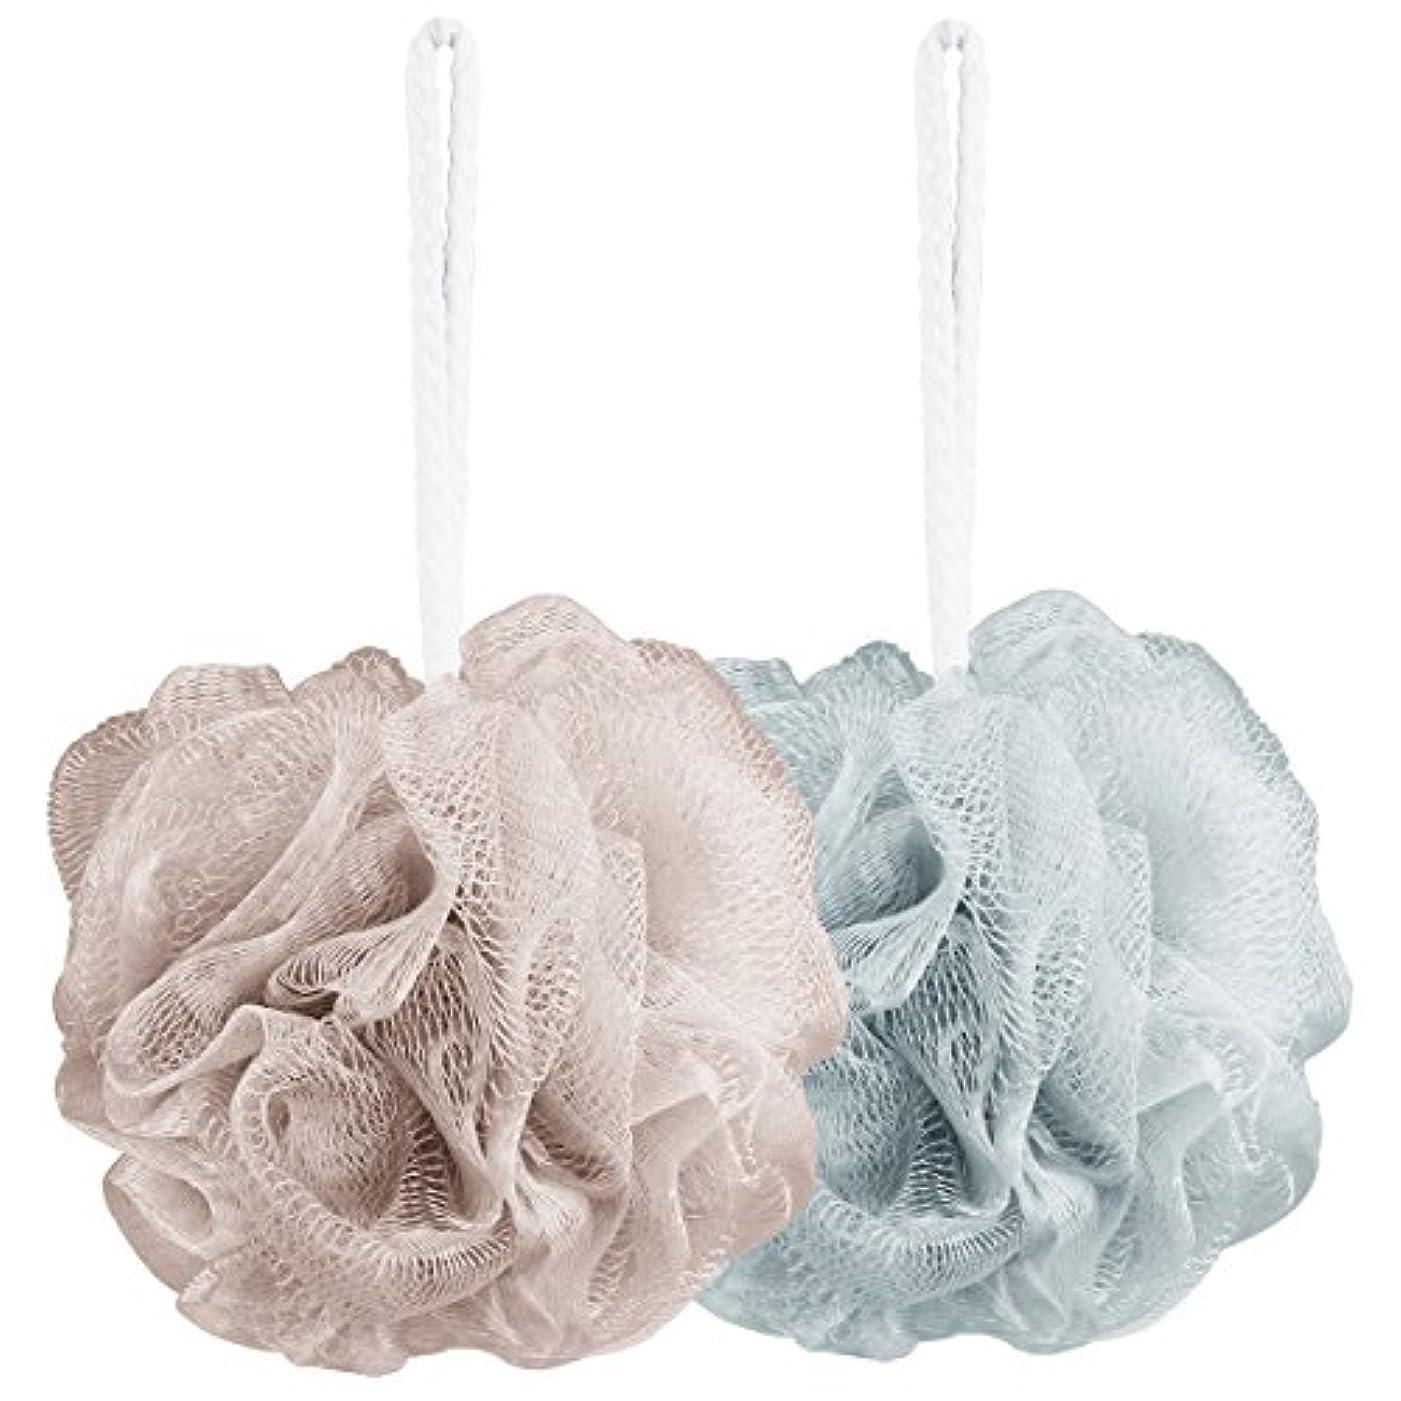 Aahlsen 泡立てネット 超柔軟 シャワー用 ボディ用お風呂ボール 花形 タオル 2点セット